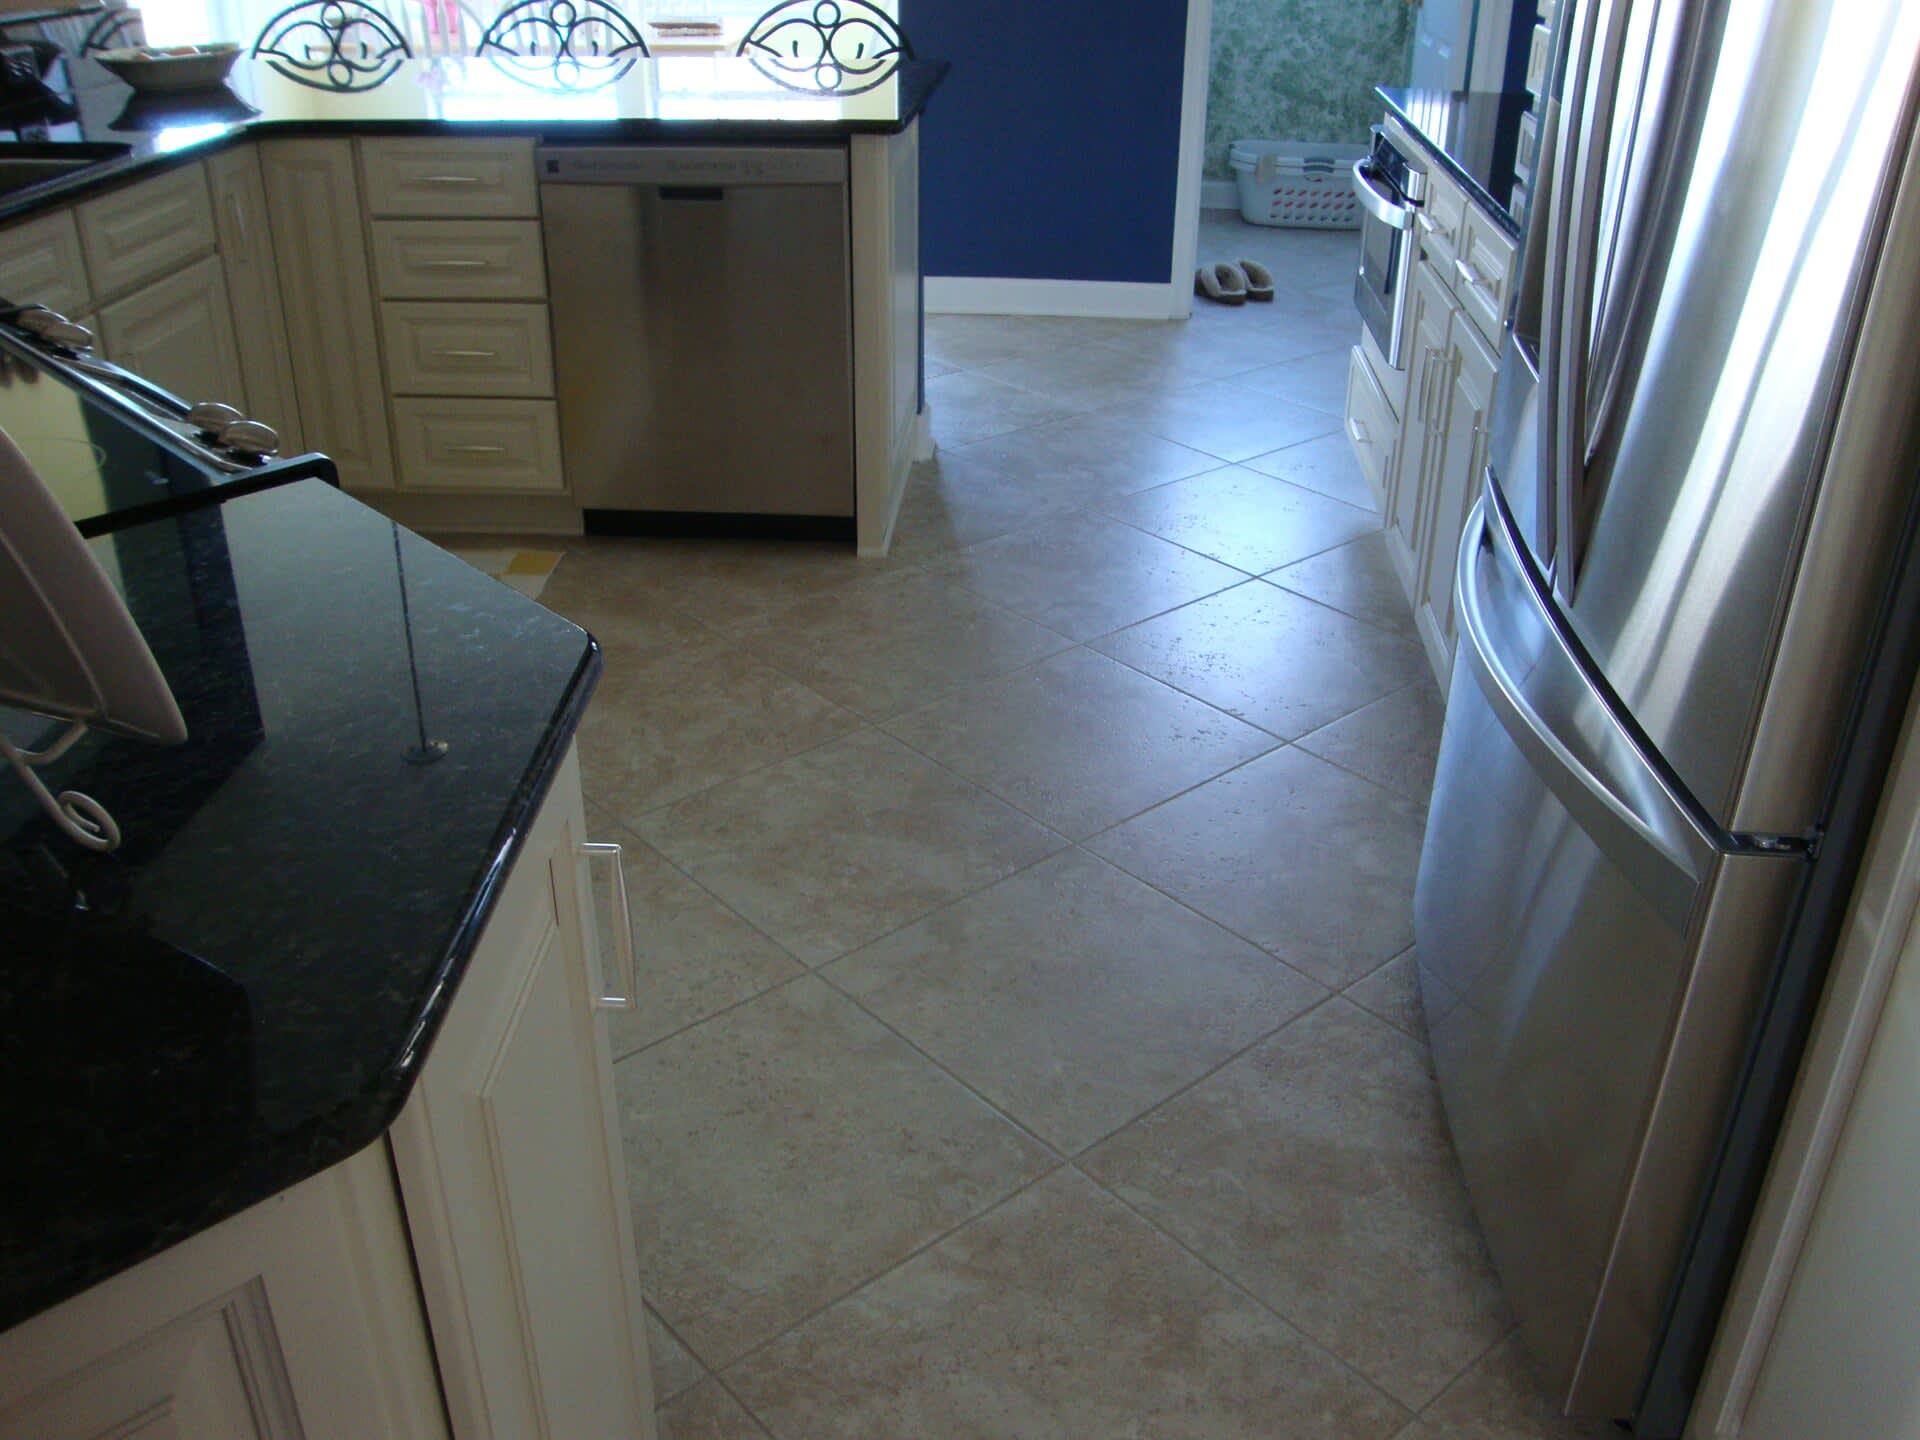 Durable tile in Norfolk, VA from Floors Unlimited